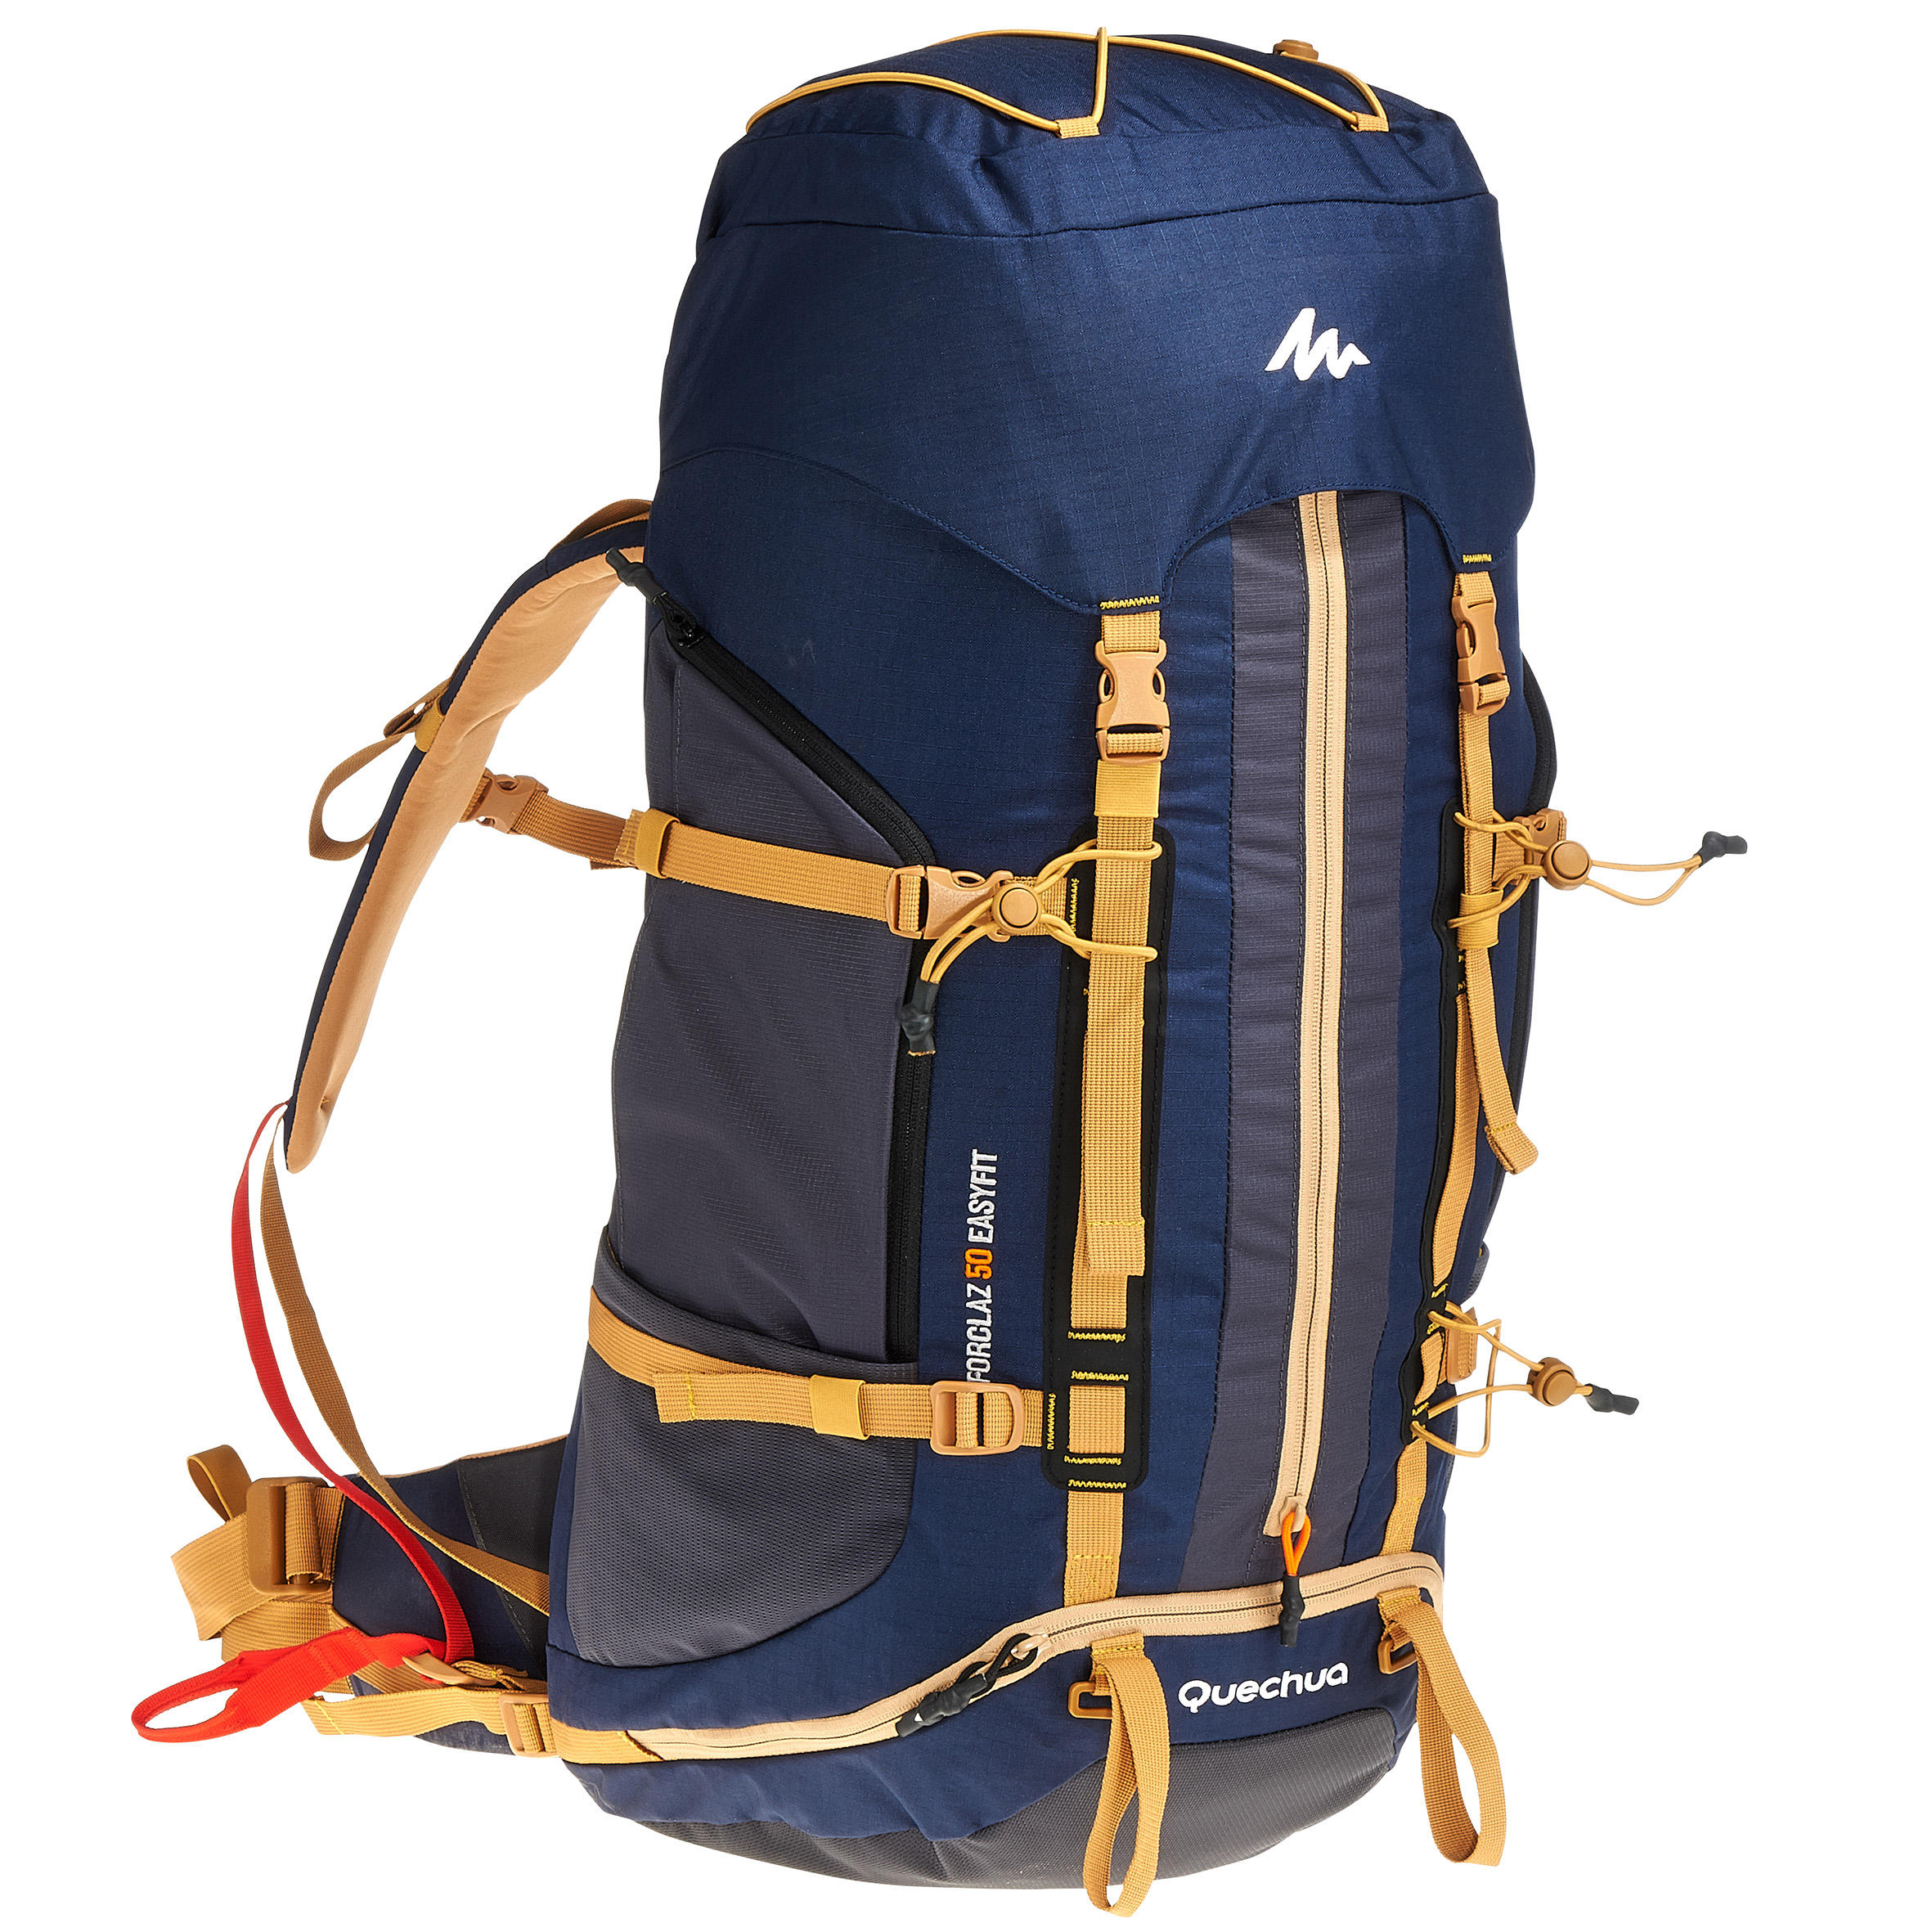 Easyfit 50 Litre Trekking Rucksack Blue